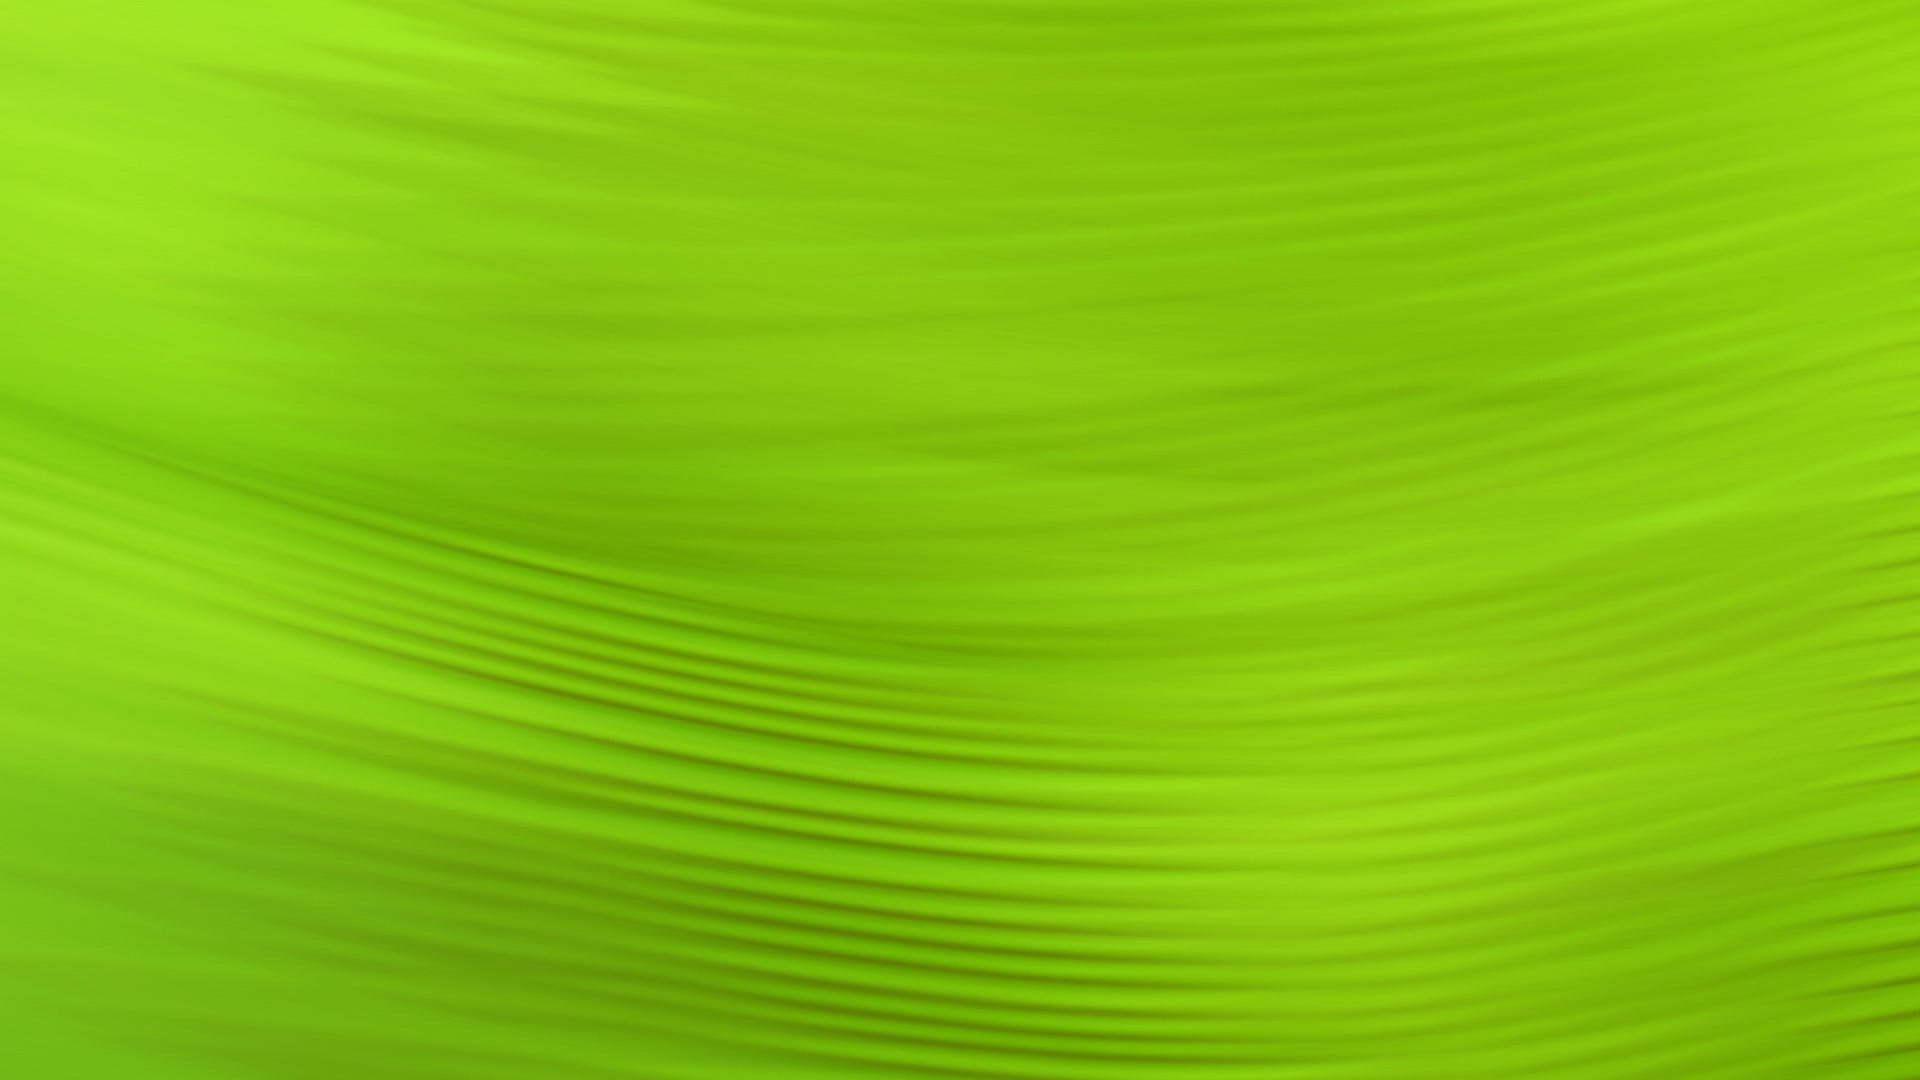 Обои бамбук текстура зелёный Фон  101506  раздел